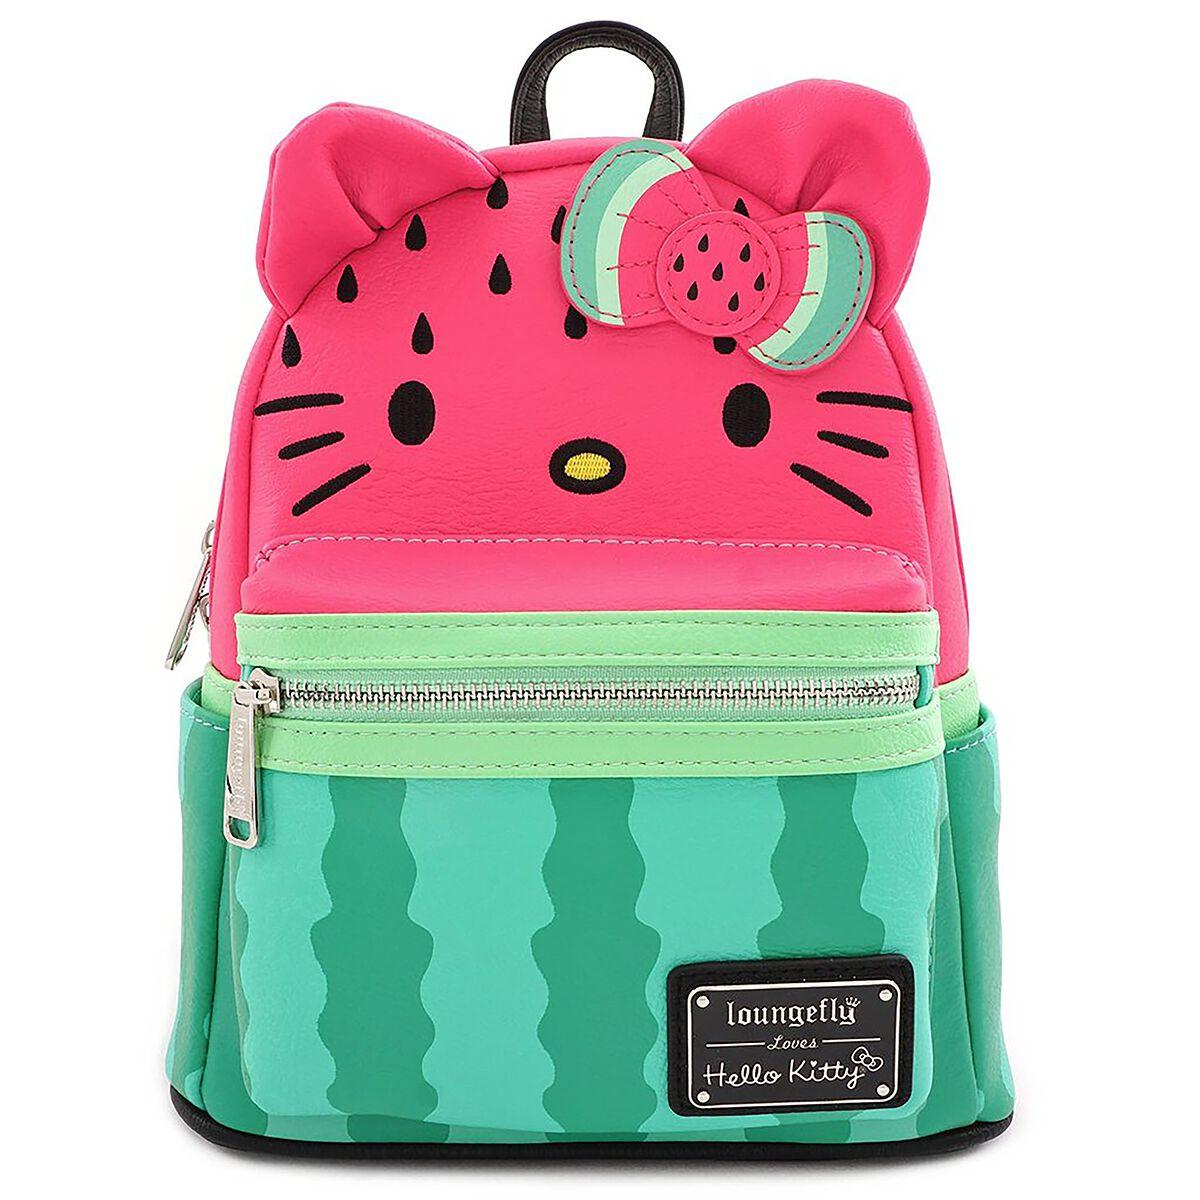 Rucksaecke - Hello Kitty Loungefly Wassermelone Mini Rucksack multicolor  - Onlineshop EMP